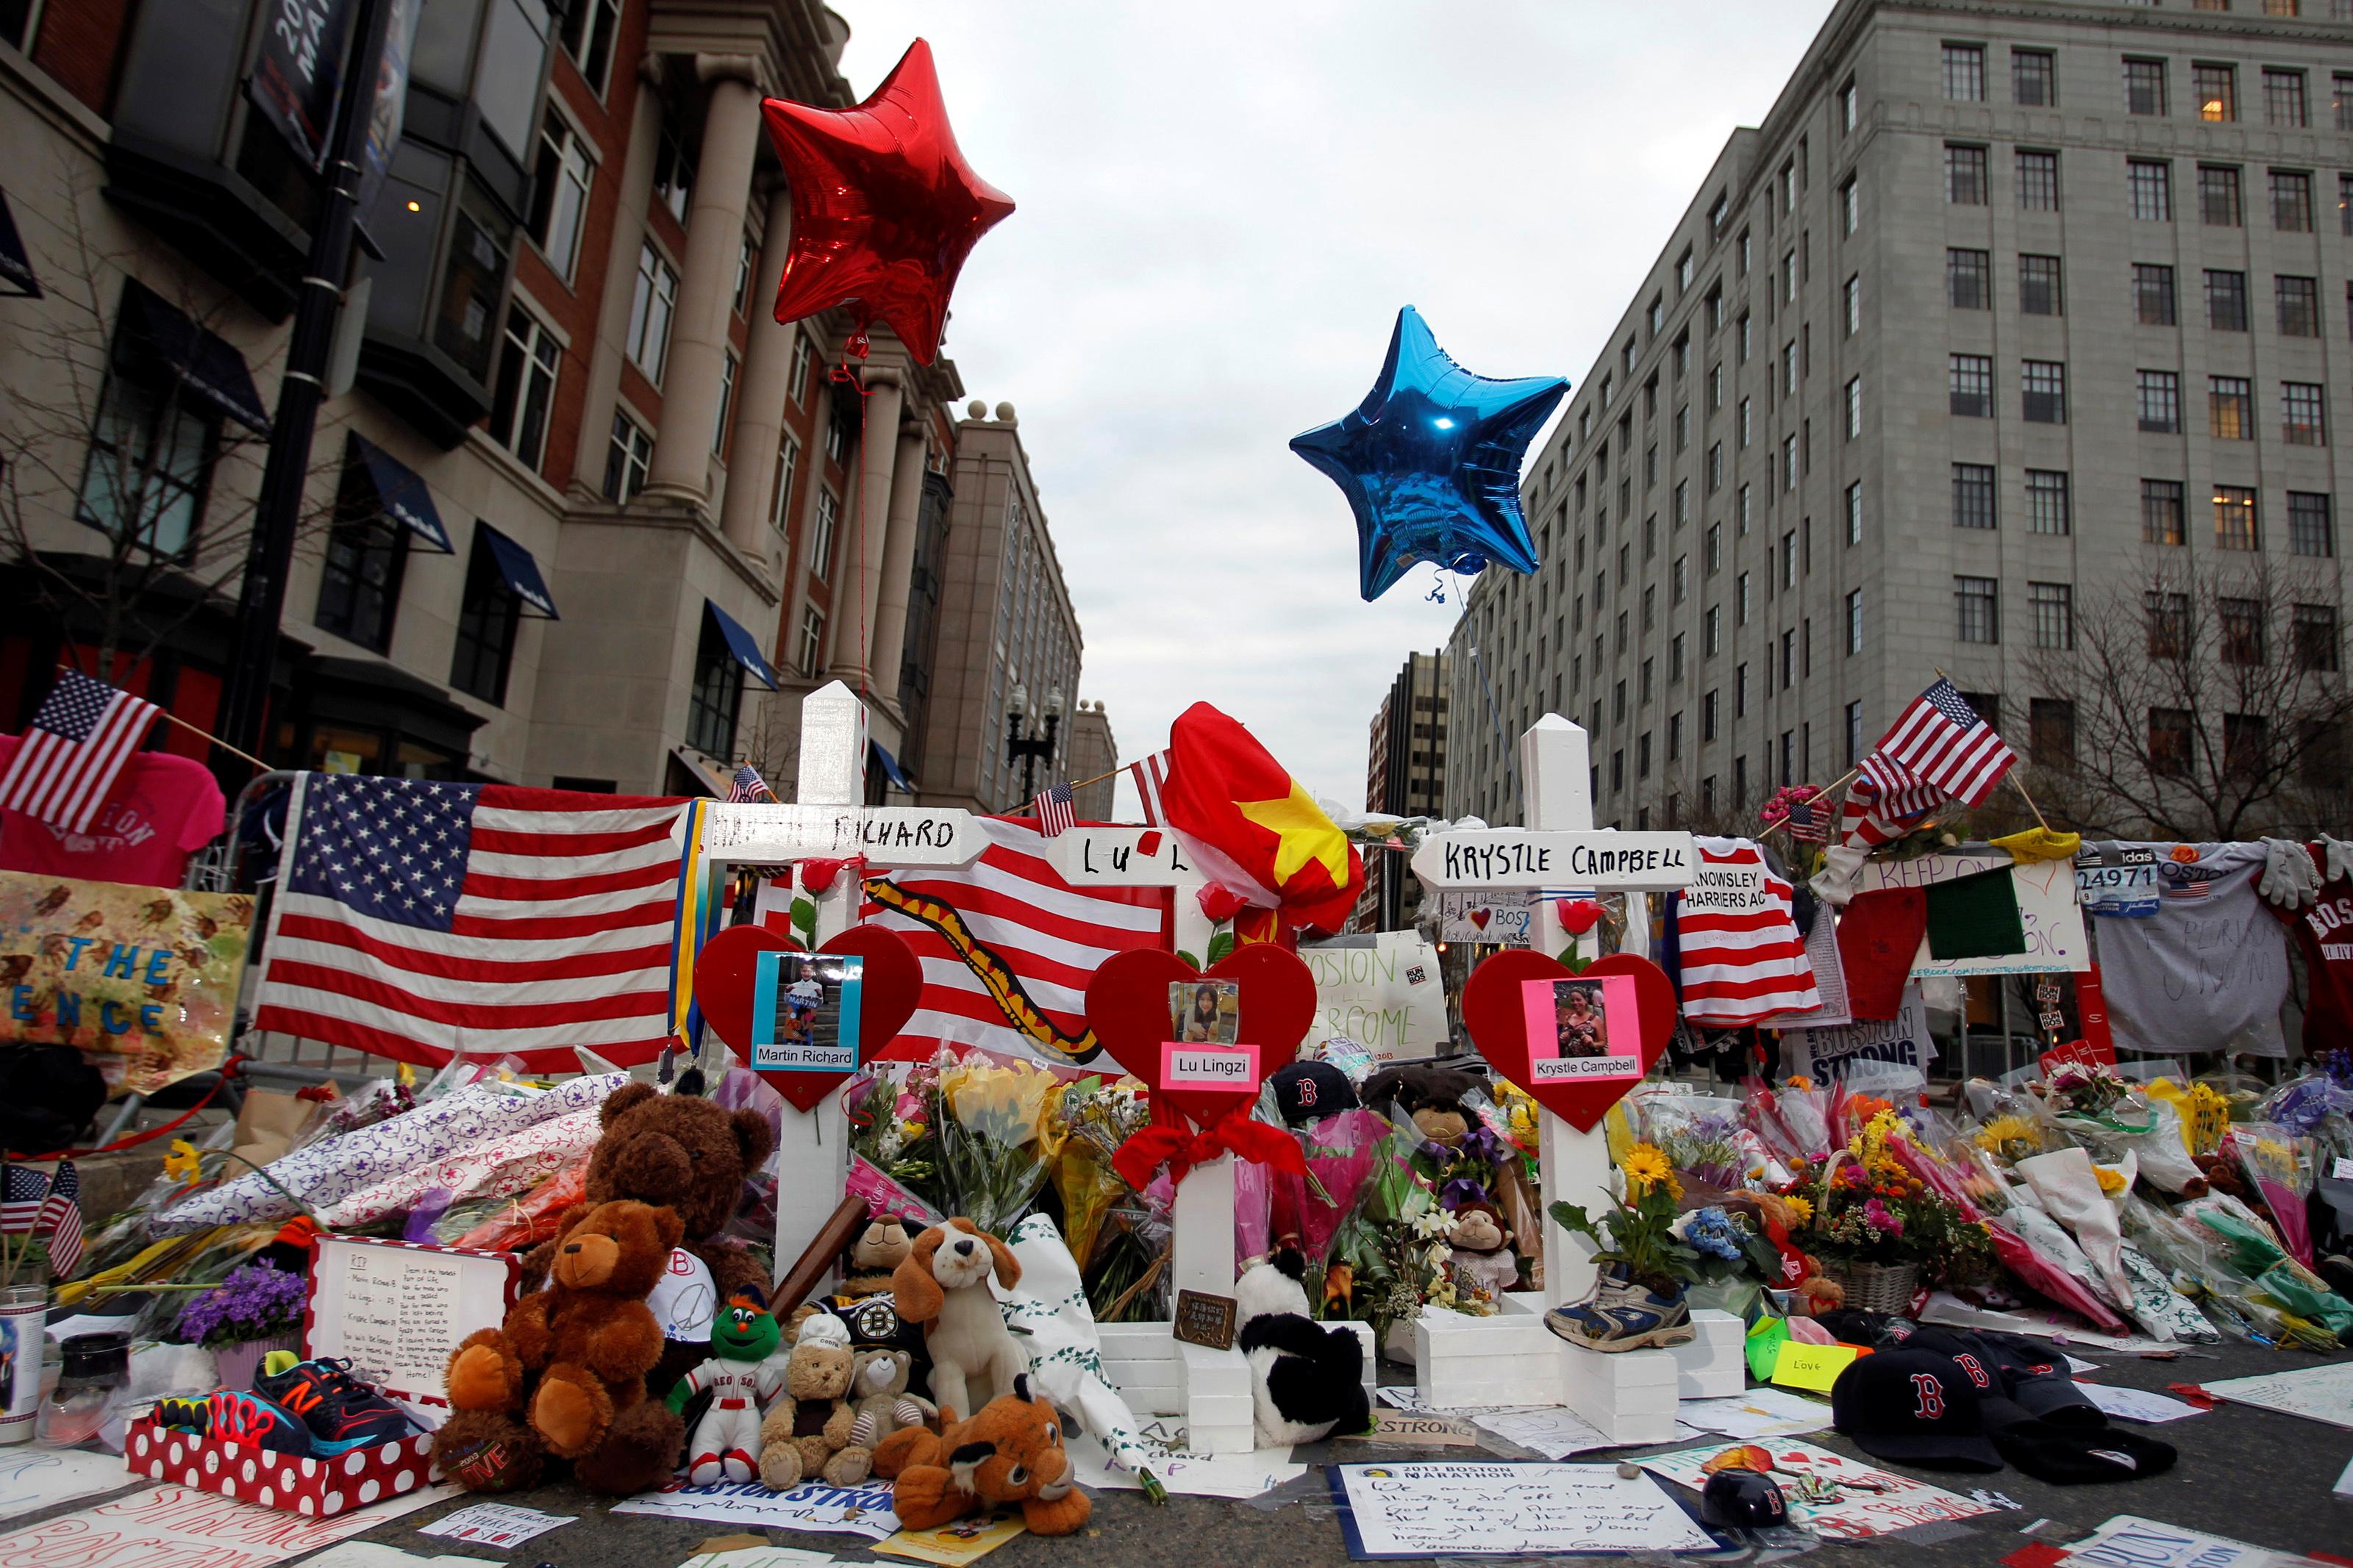 Three crosses for each of the three people killed in the Boston Marathon bombings at a makeshift memorial on Boylston Street in Boston, Massachusetts, April 18, 2013. REUTERS/Jessica Rinaldi